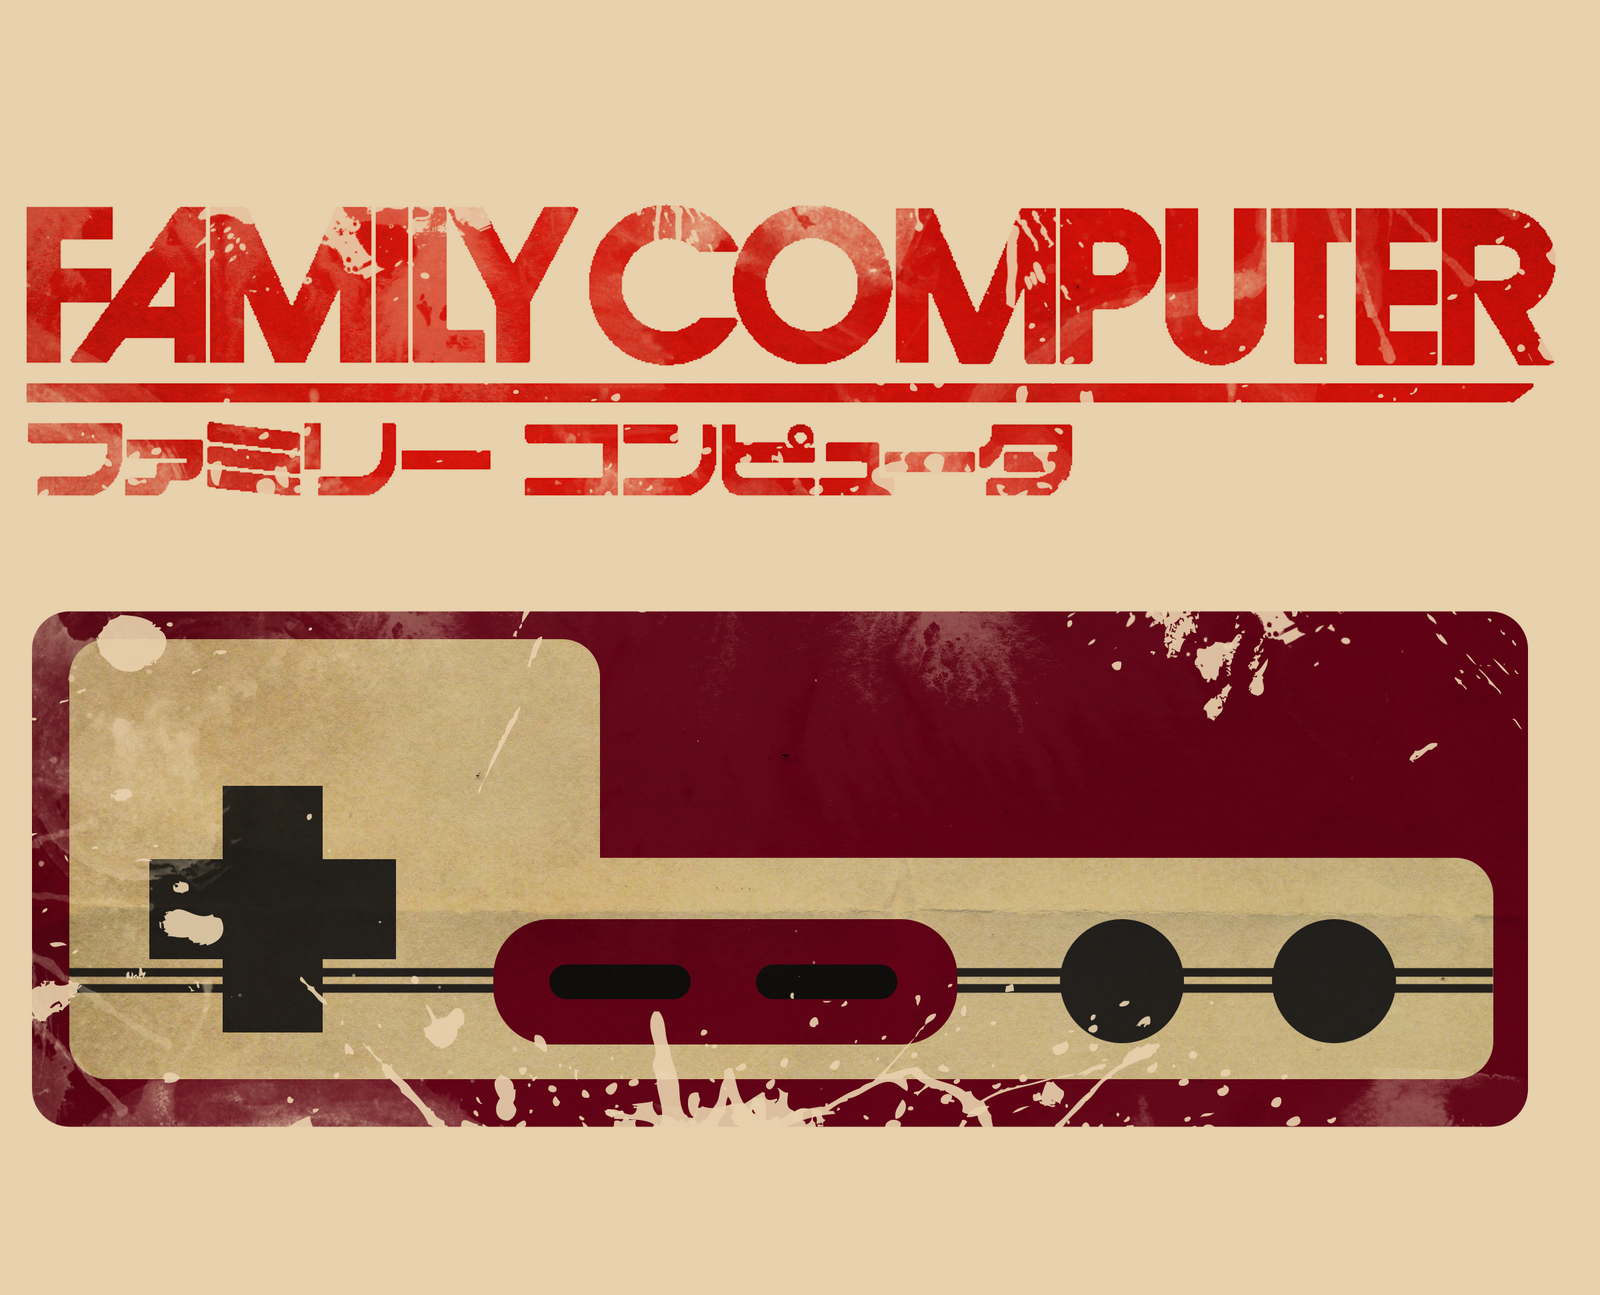 Famicom by tjhiphop on DeviantArt